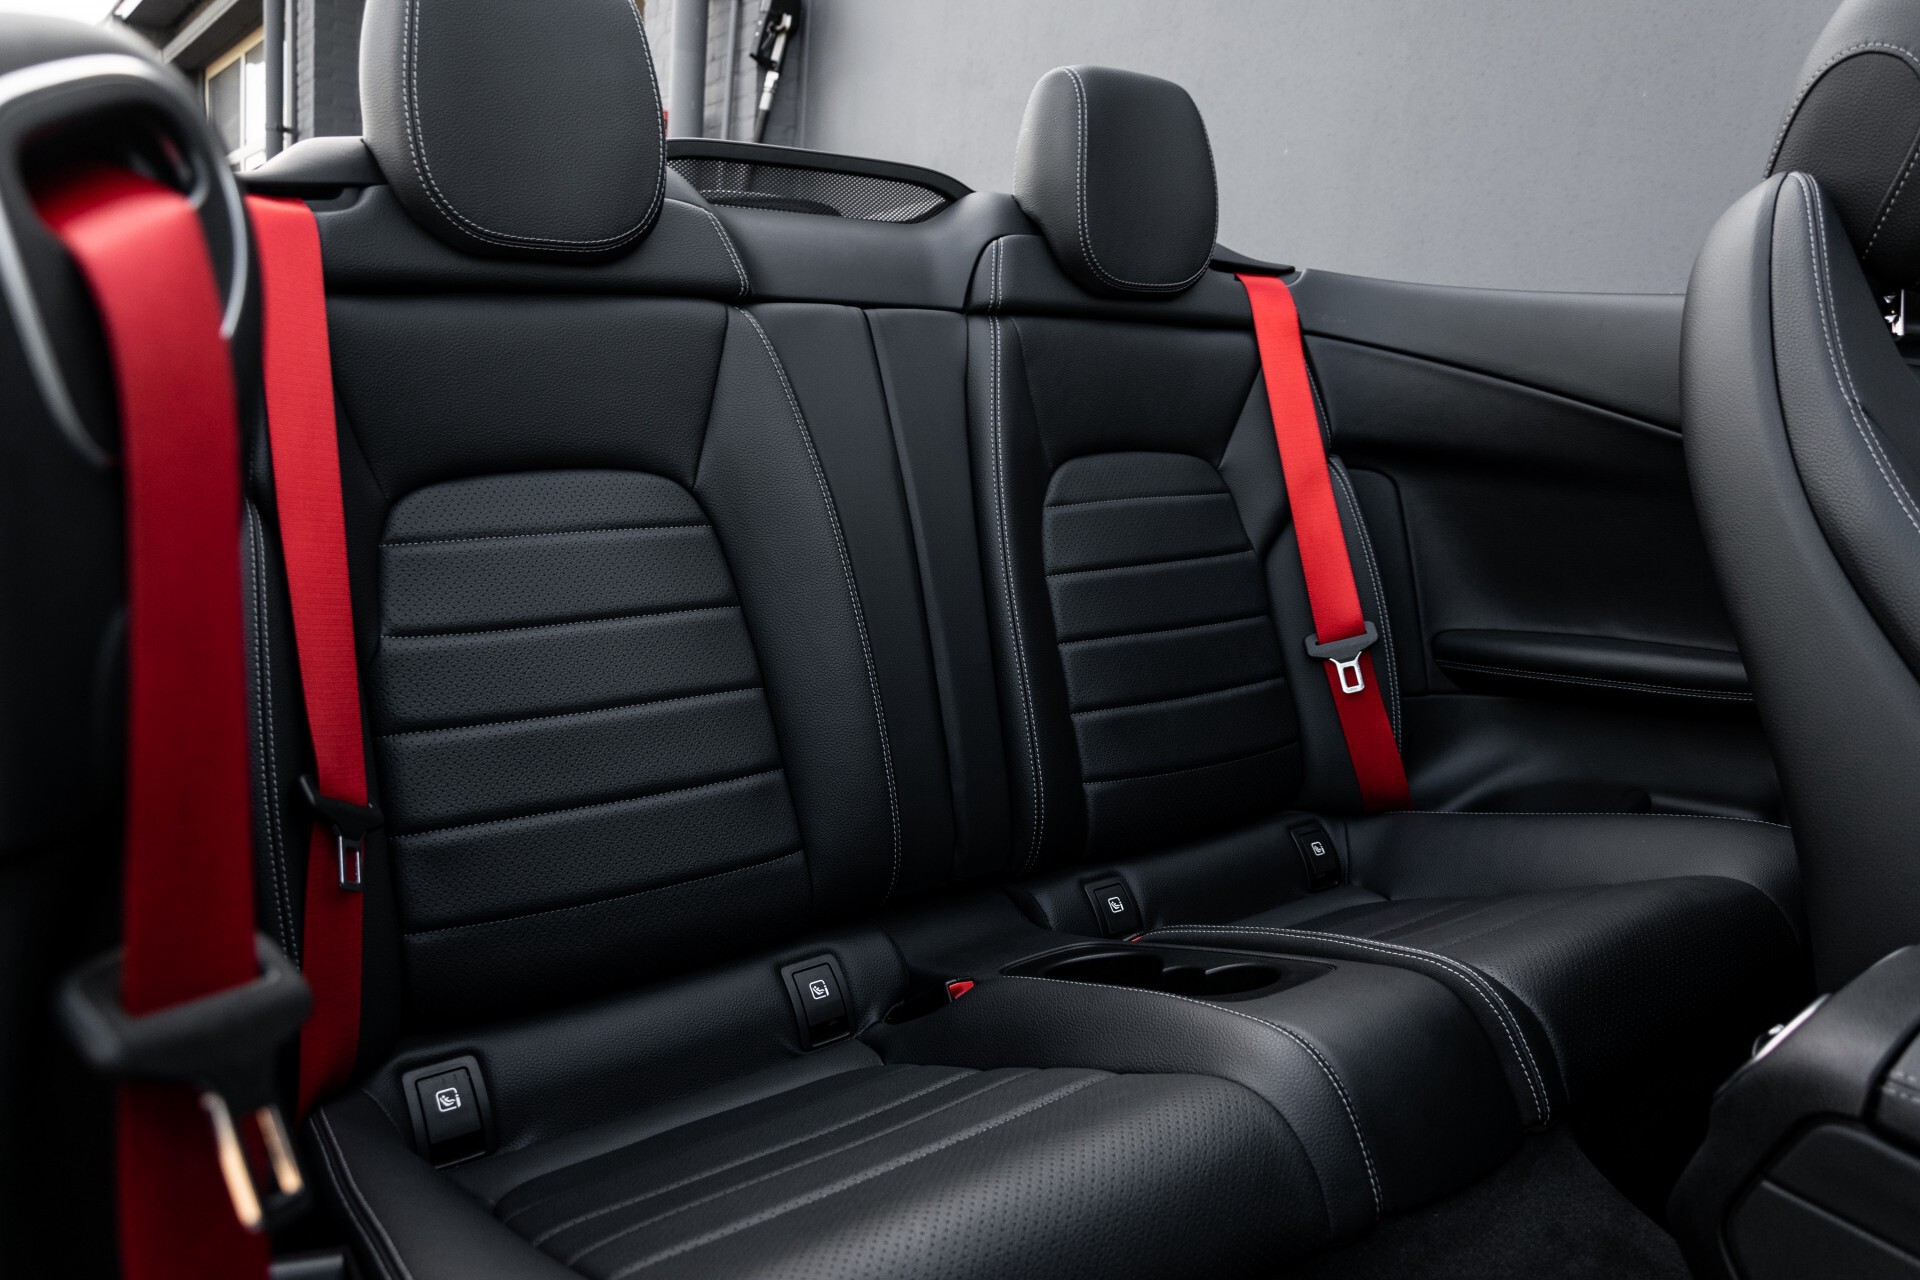 Mercedes-Benz C-Klasse Cabrio 250 AMG Airscarf/Aircap/Comand/ILS/Camera/Rode cabriokap Aut9 Foto 6